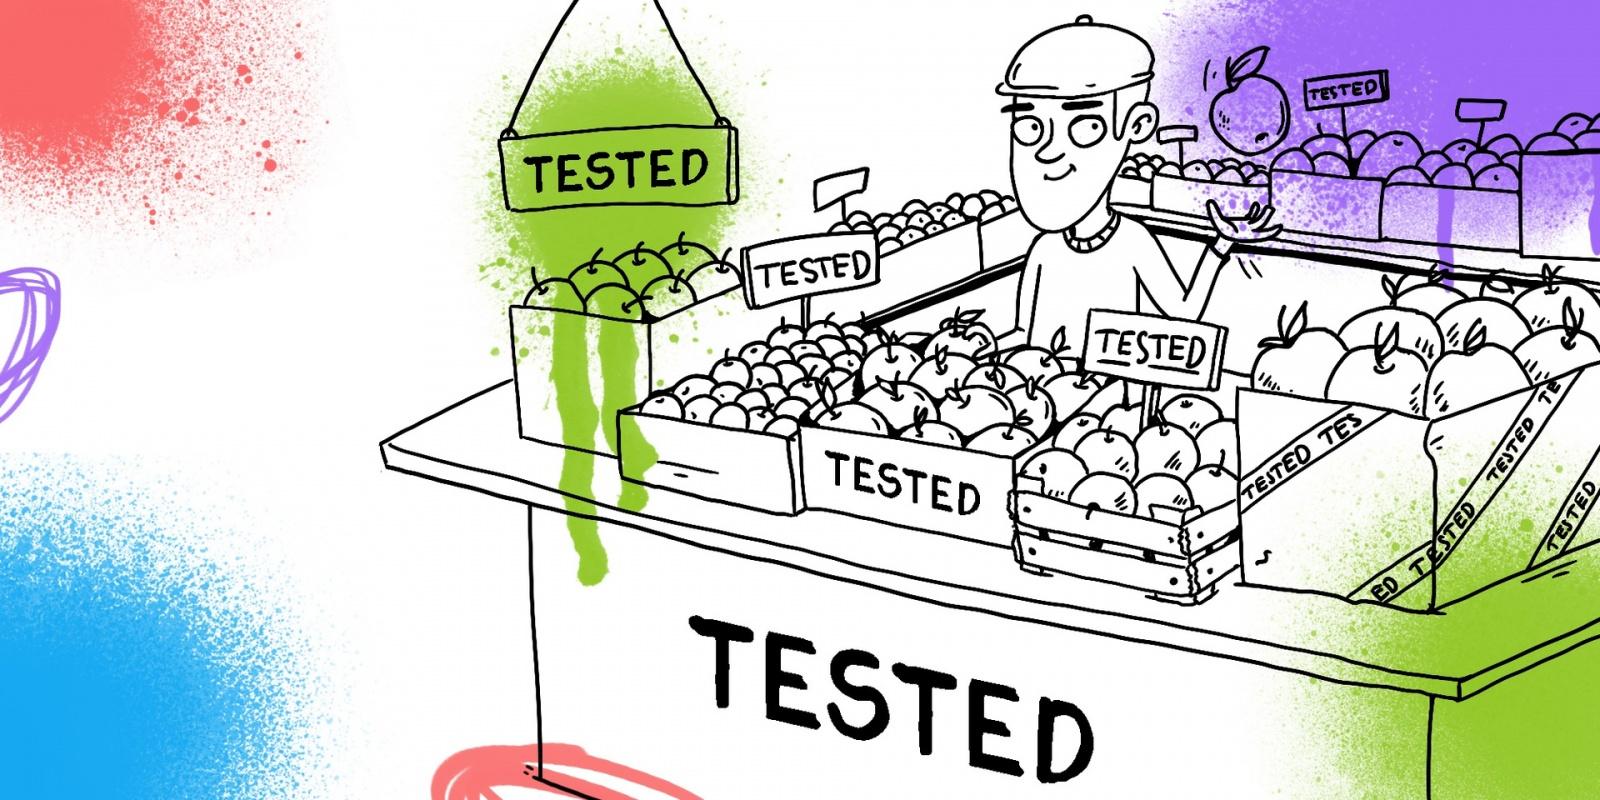 Ядро автоматизации тестирования в микросервисной архитектуре - 1